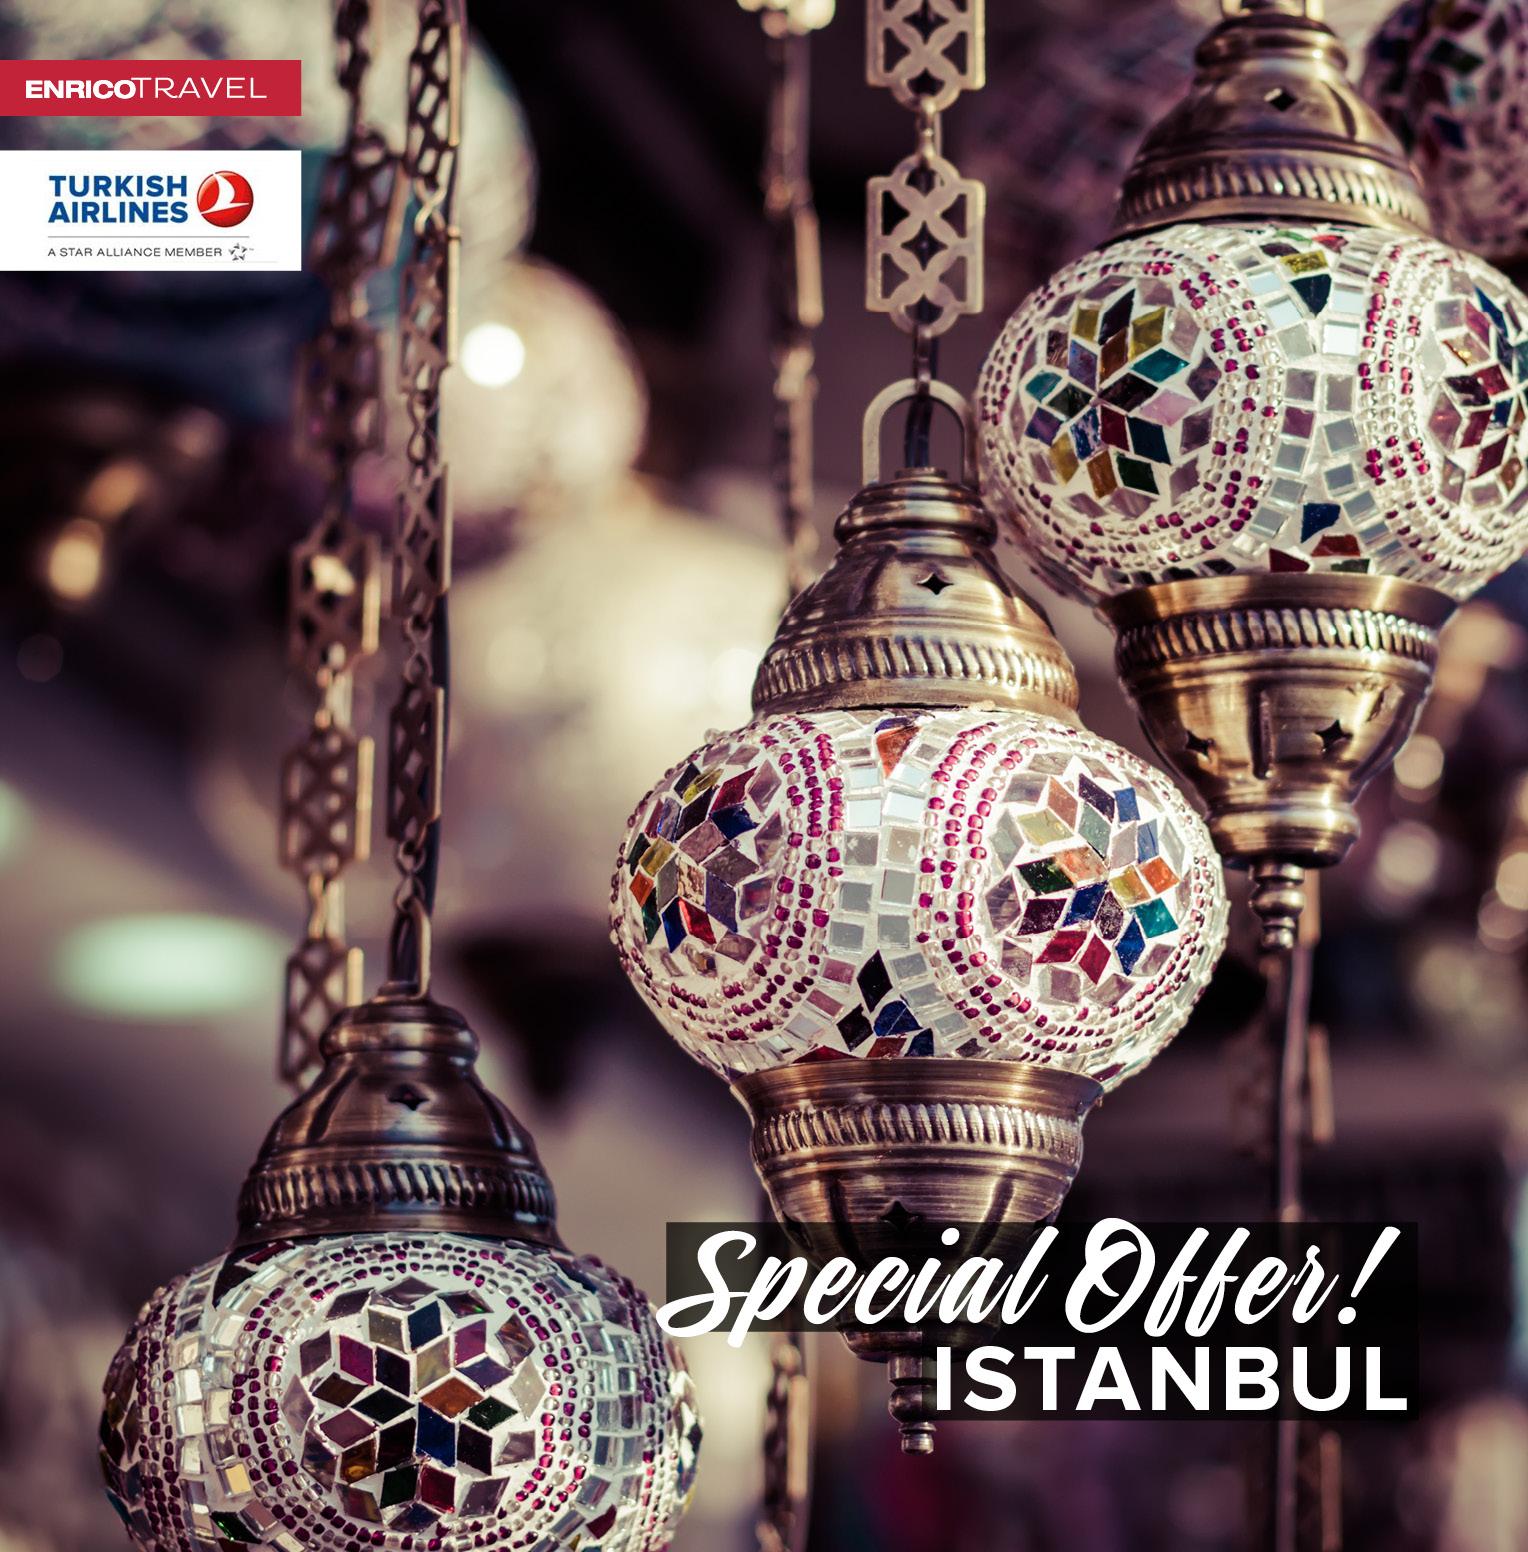 ISTANBUL ADVERTS 2018 FB POST 5